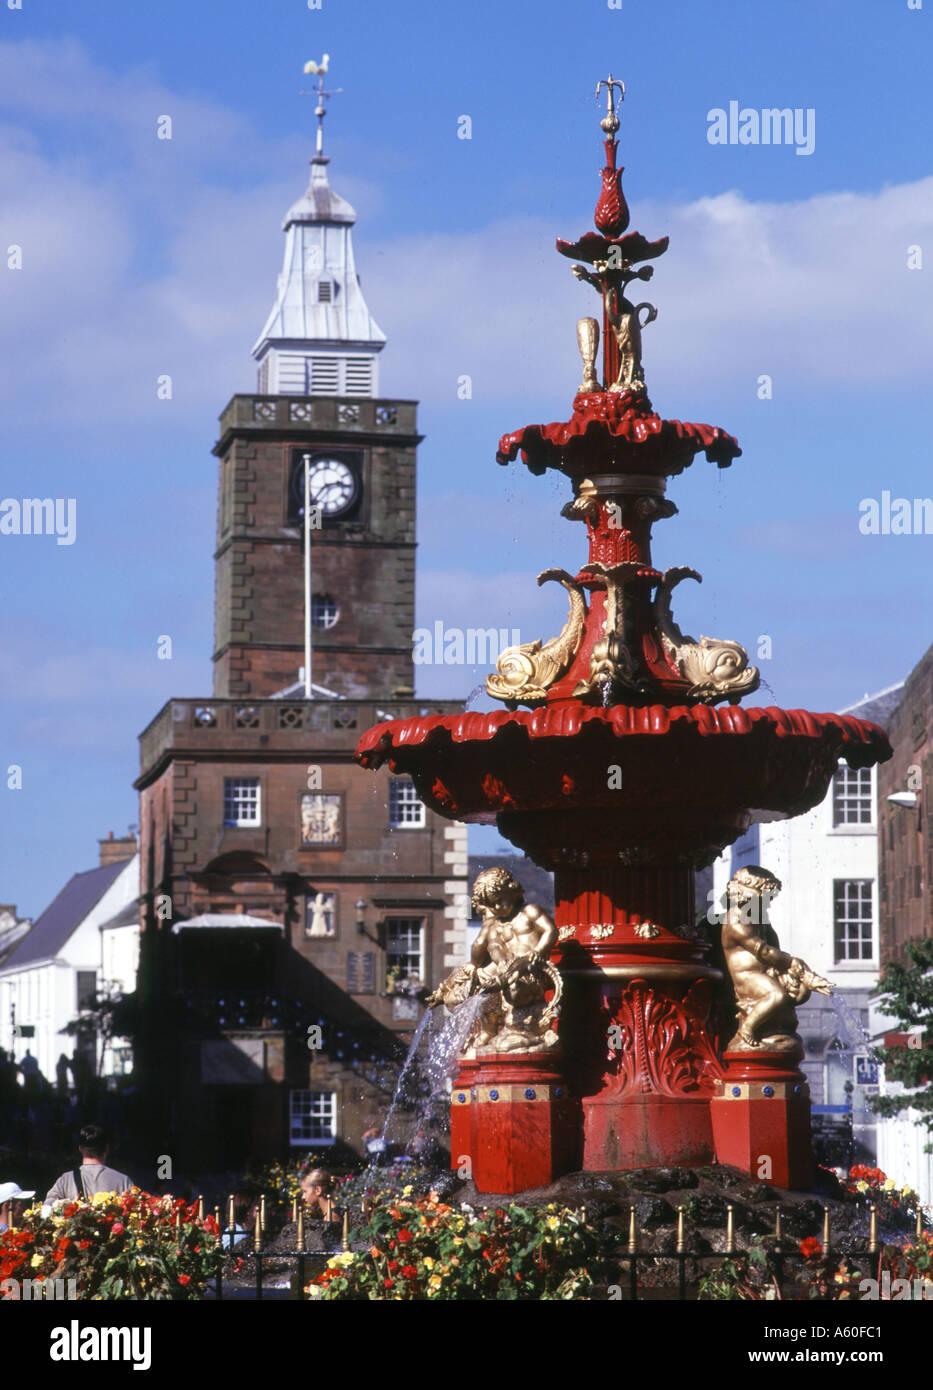 dh Town House DUMFRIES GALLOWAY Fountain main street shopping centre Stock Photo